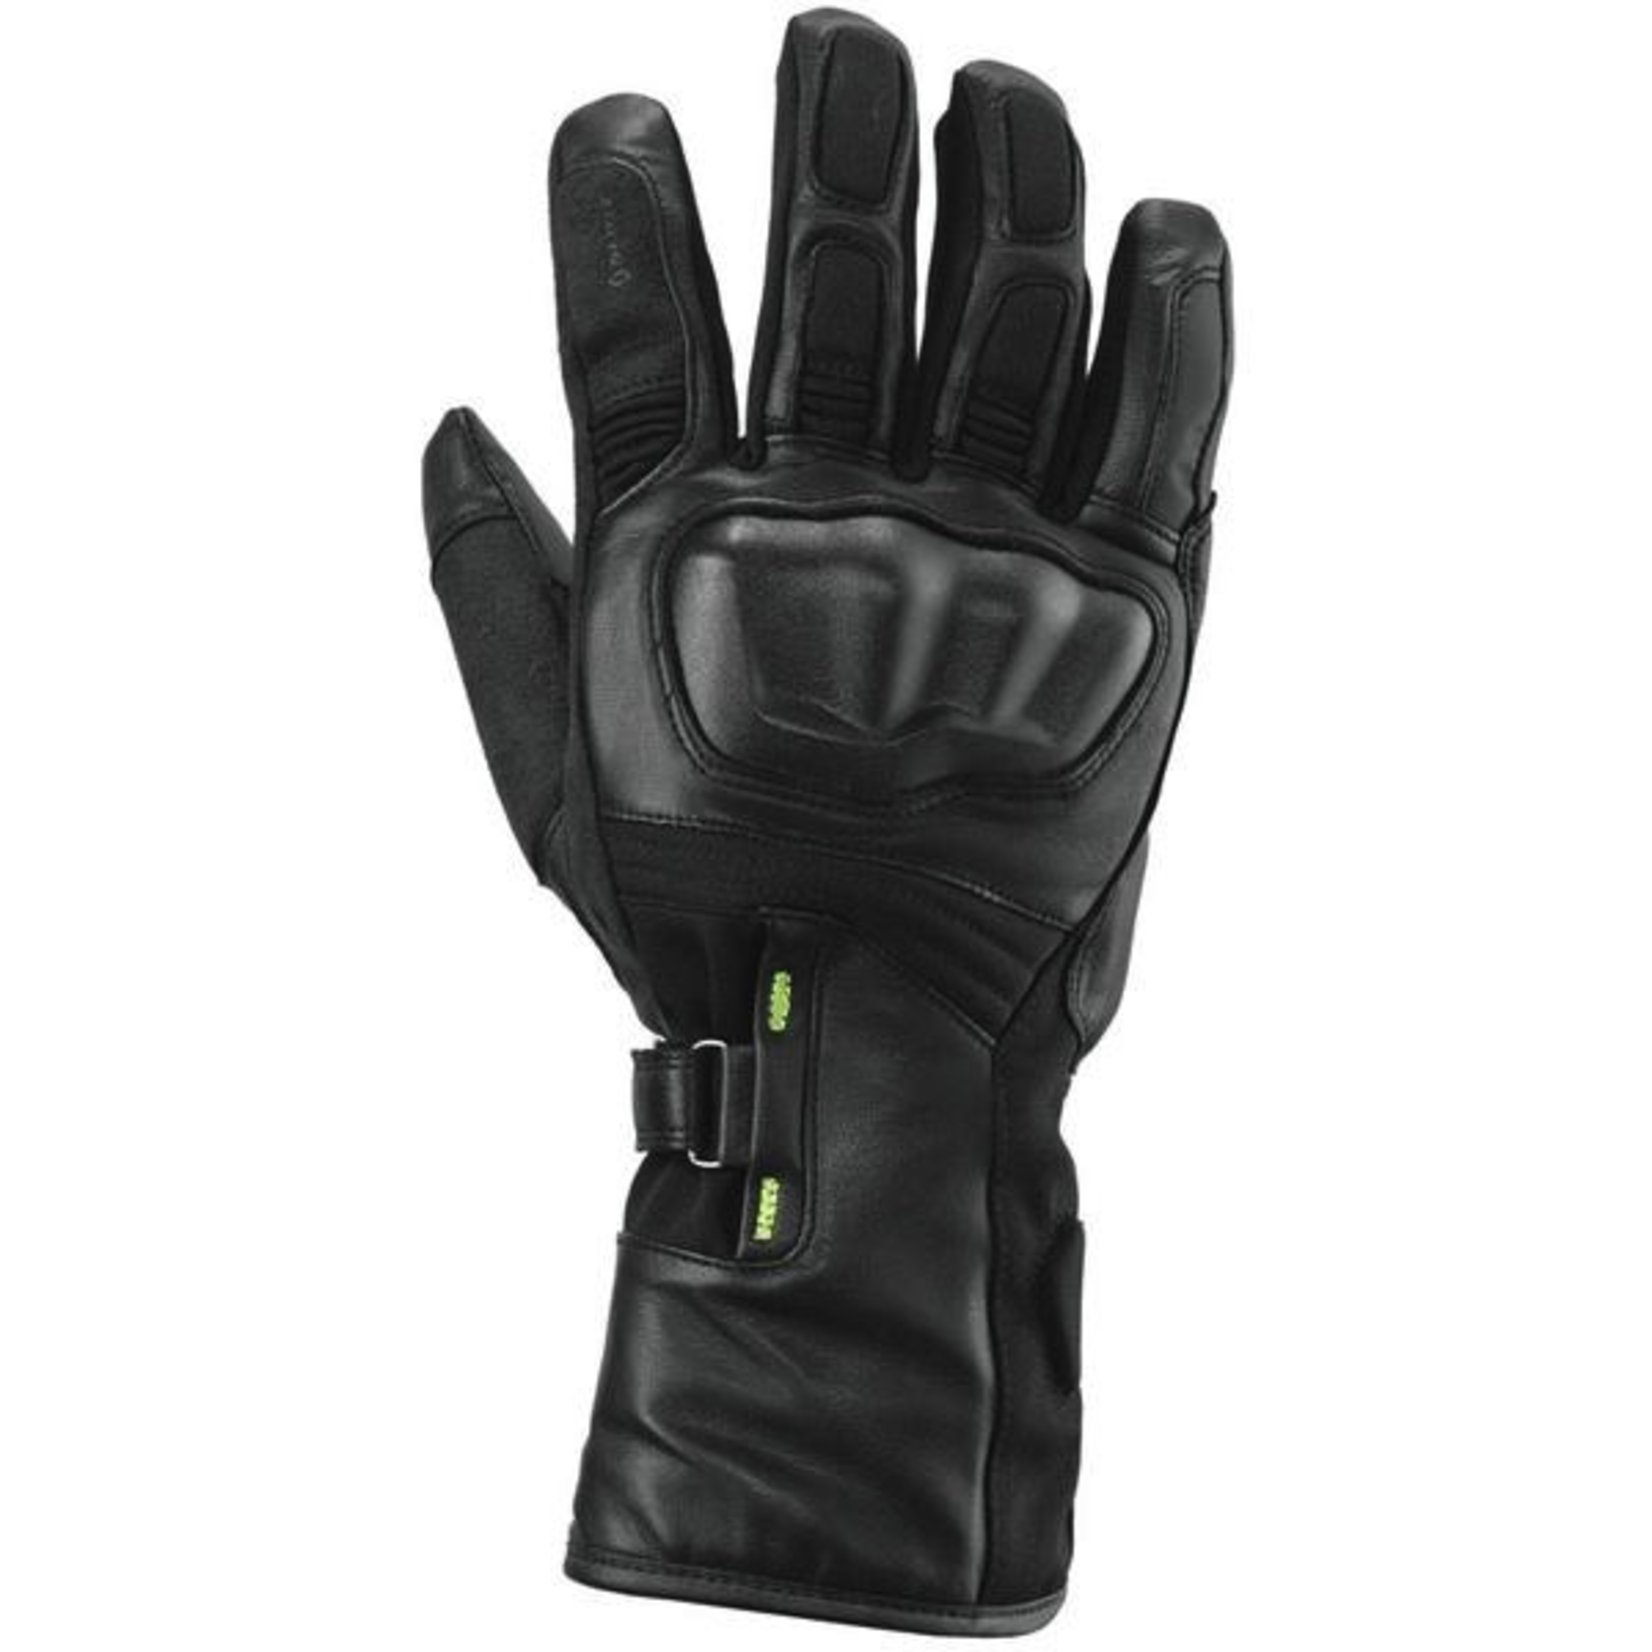 Apparel Glove, SCOTT Technit Waterproof/Cool Weather Nappa Goatskin